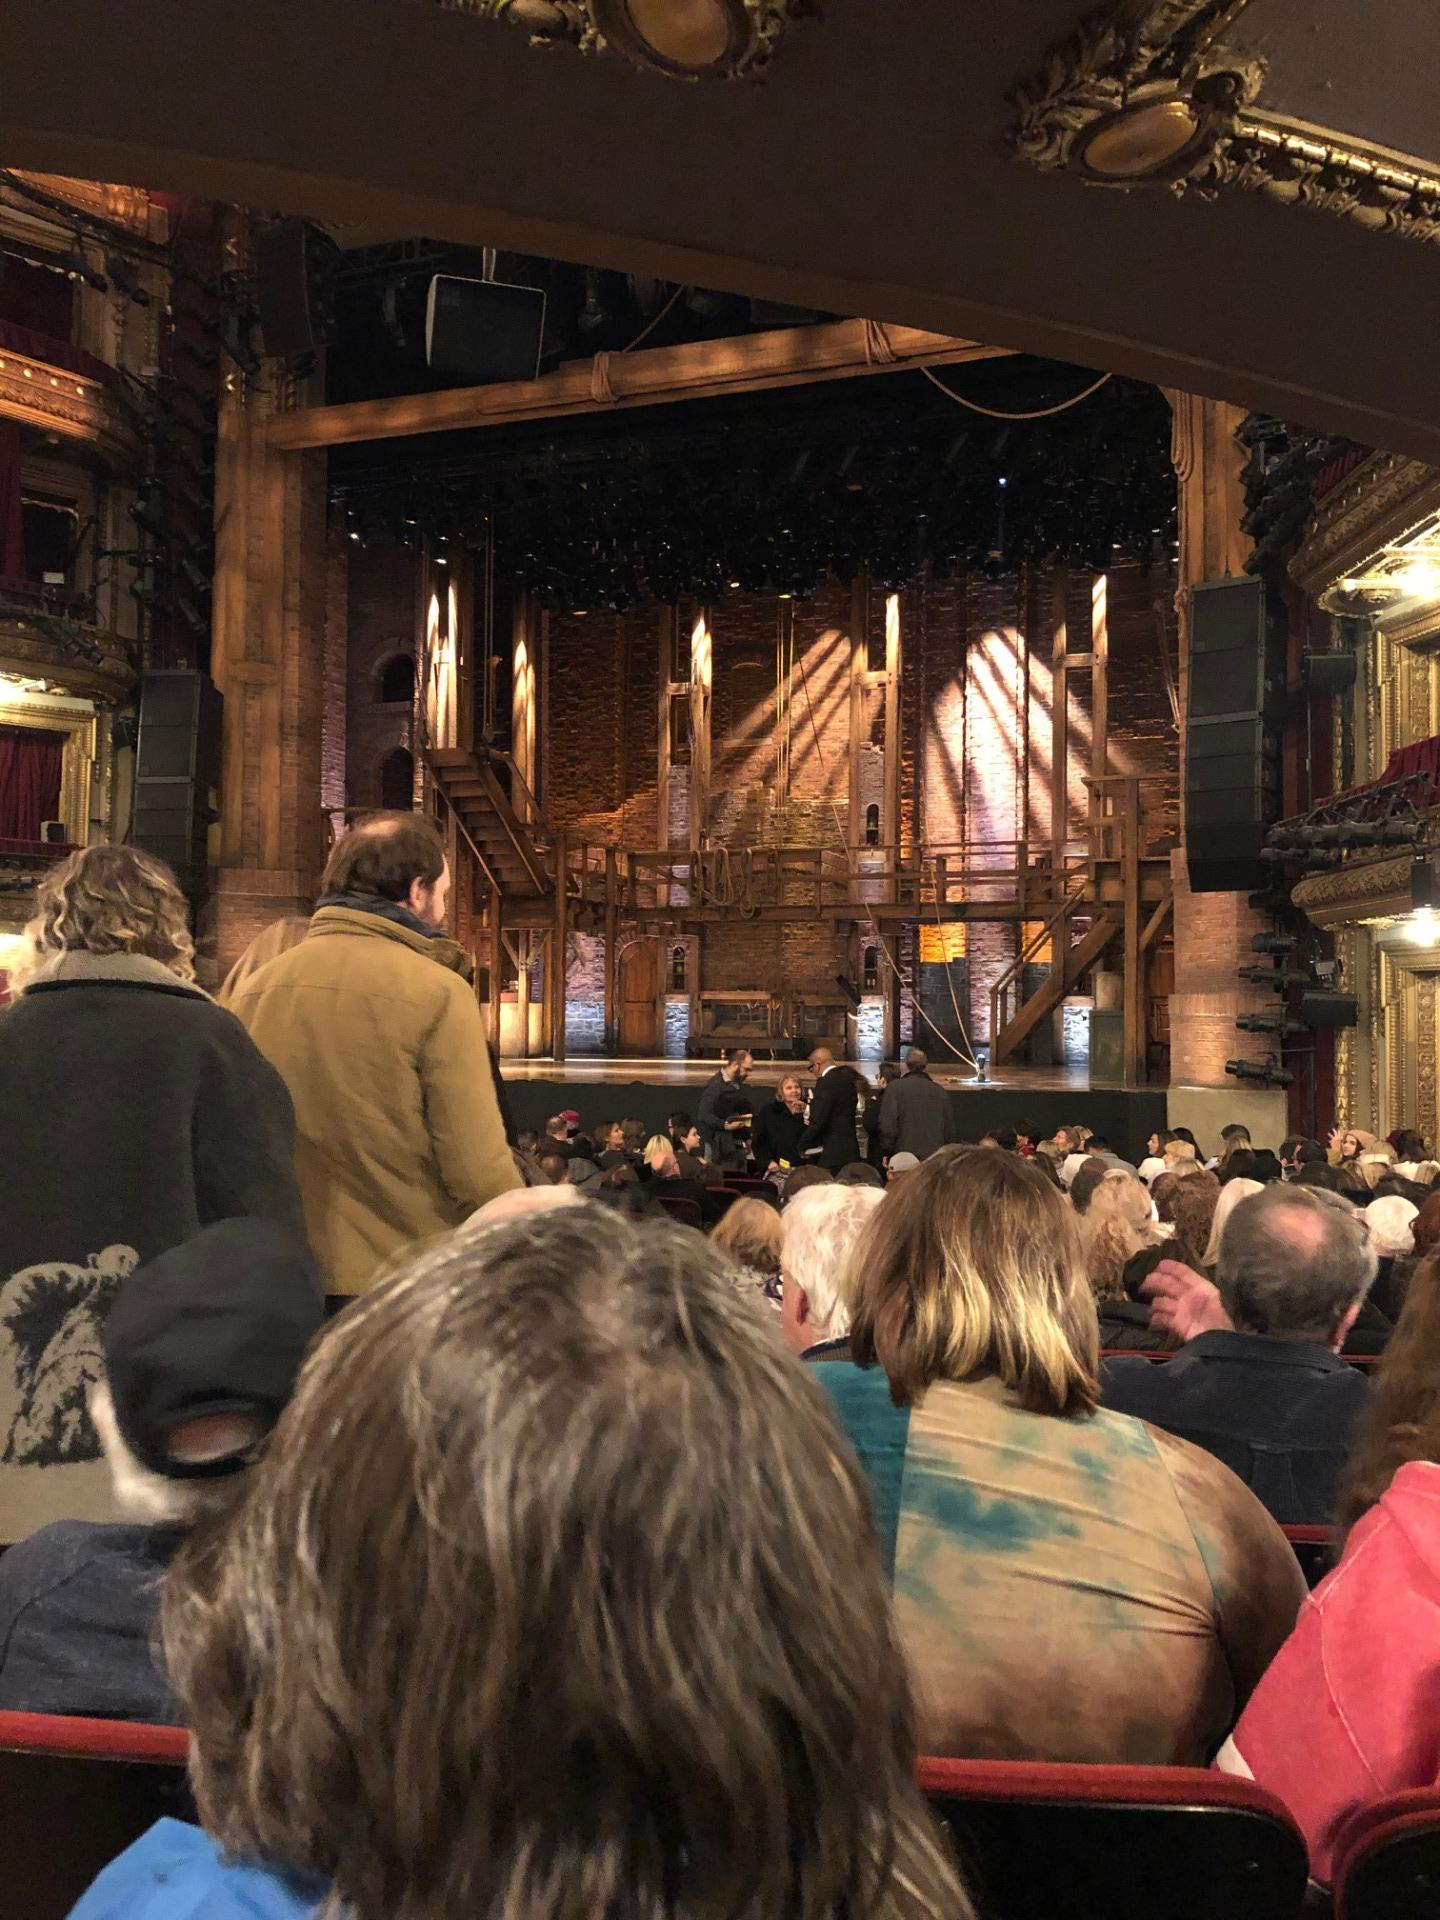 CIBC Theatre Section Orchestra R Row U Seat 2